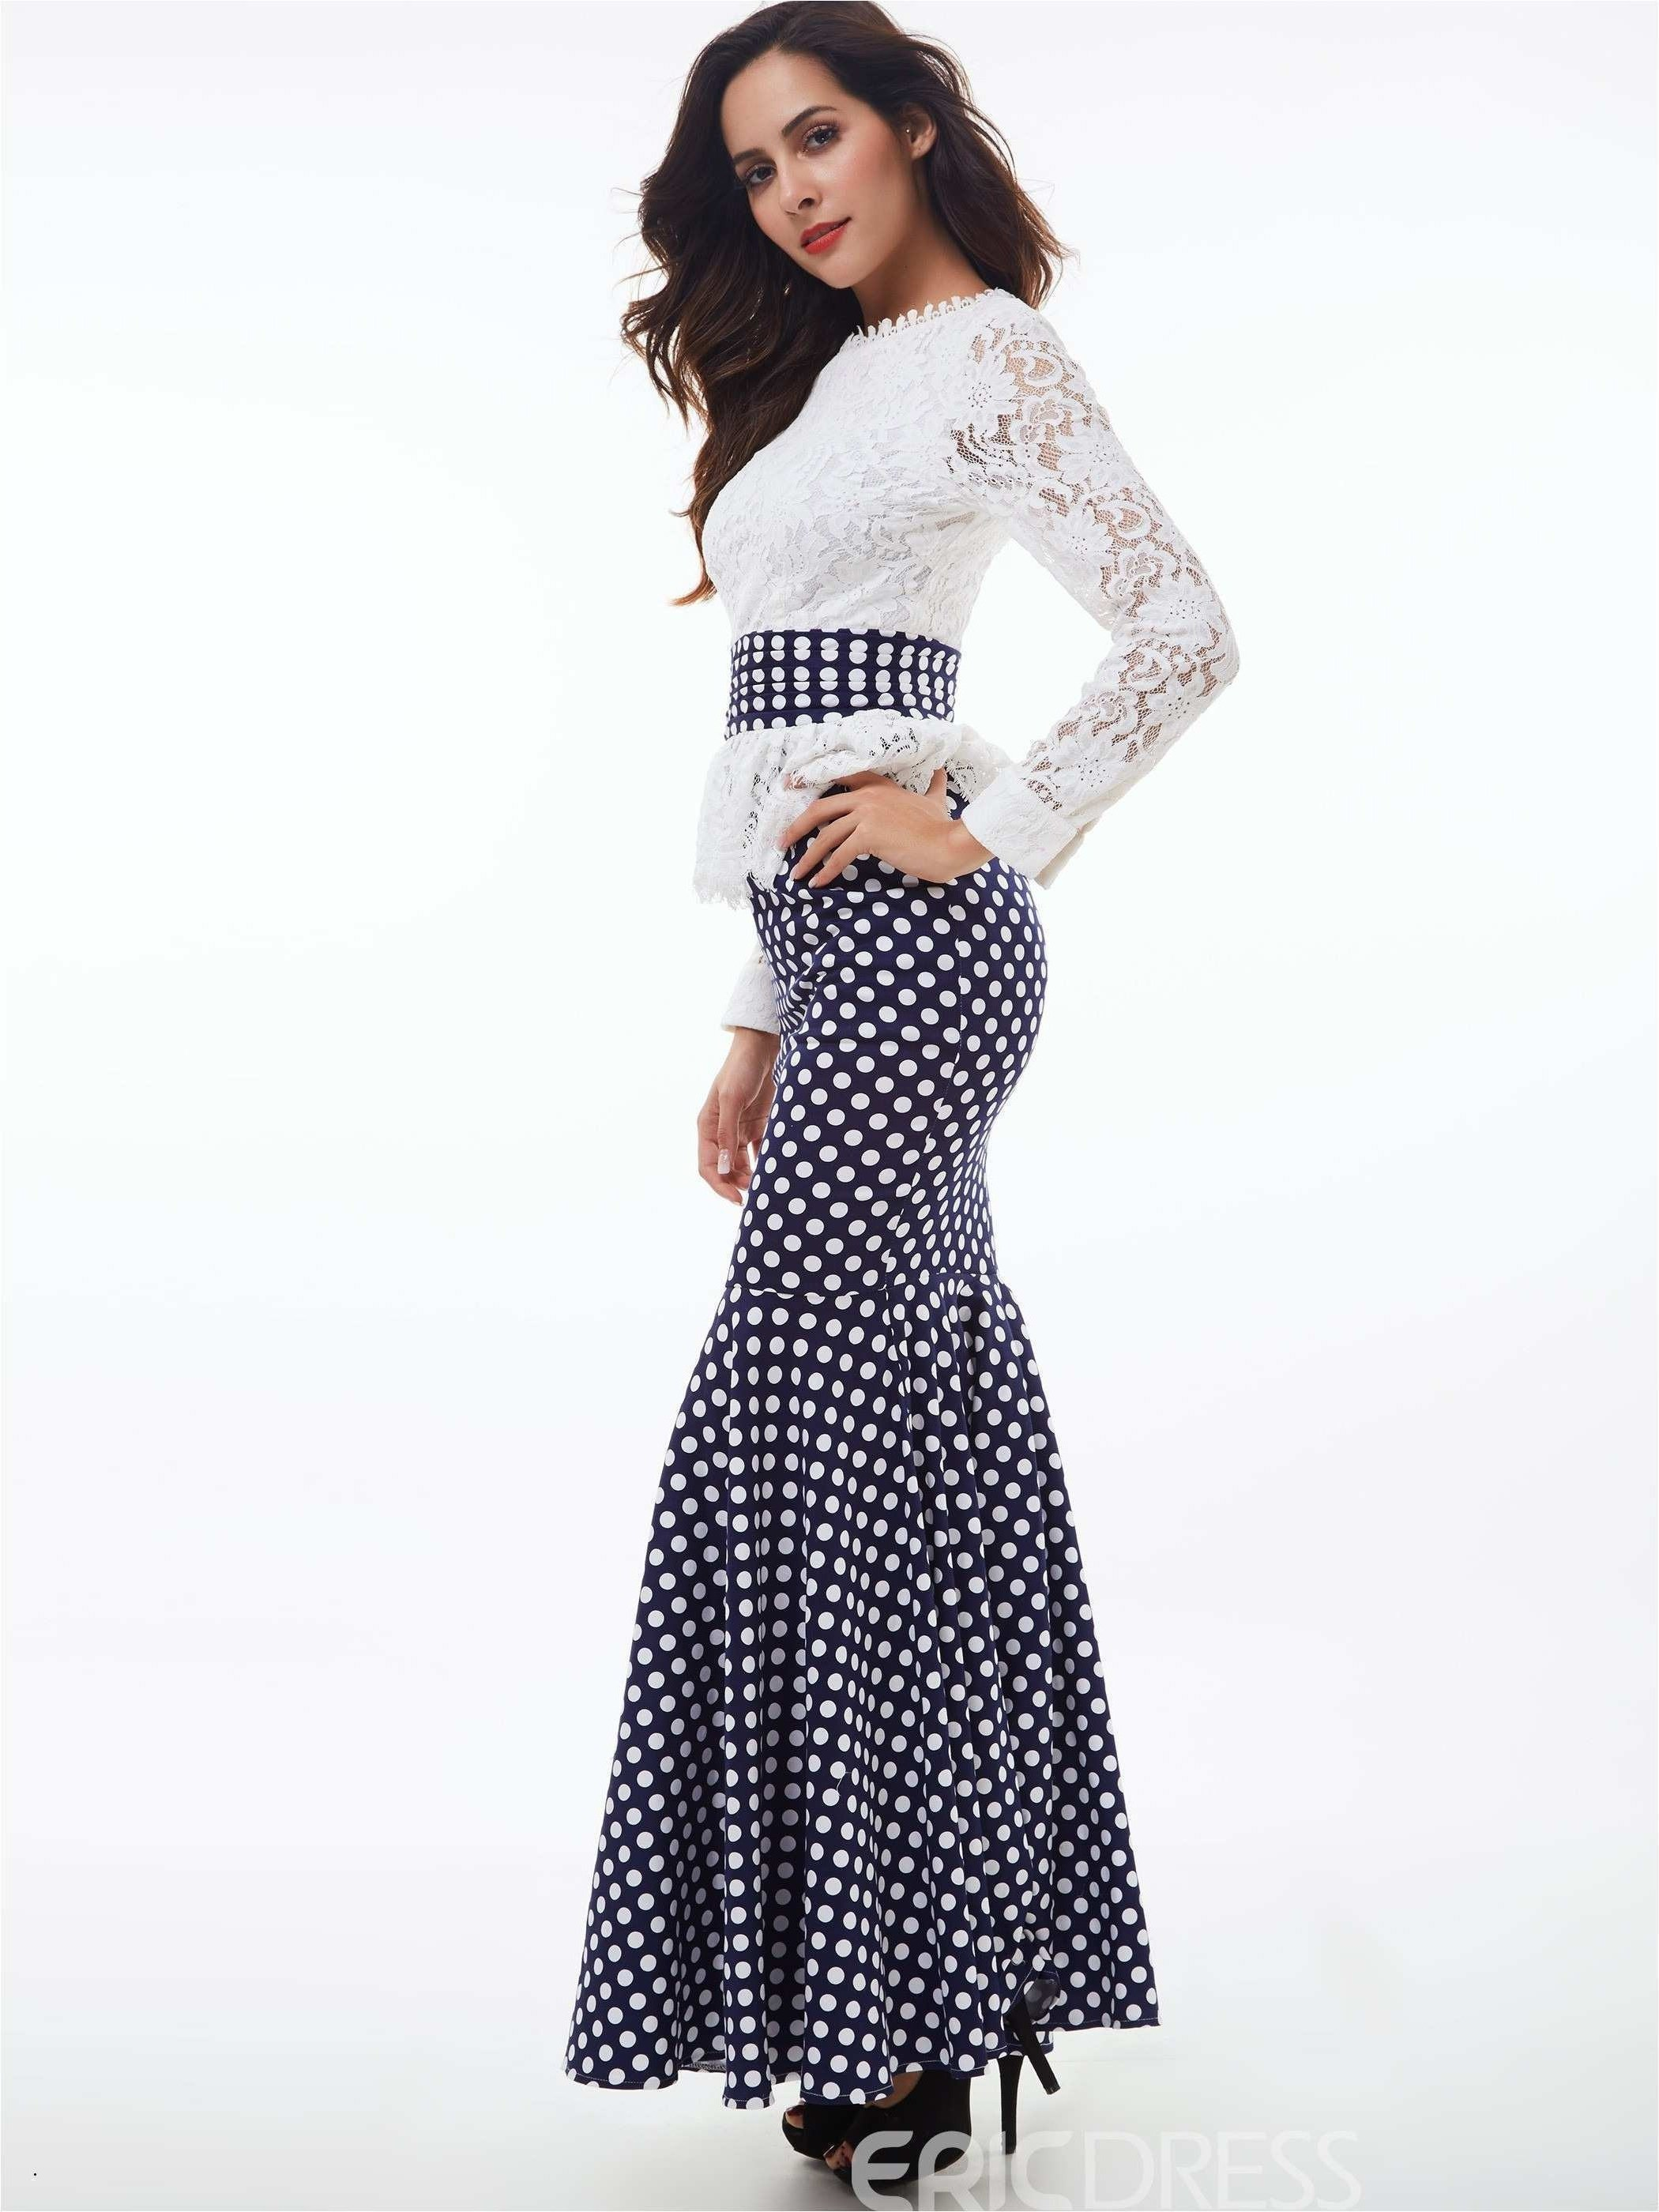 Model Inspirasi Baju Pengantin Muslimah Wddj 36 Bentuk Baju Pengantin Muslim Pria